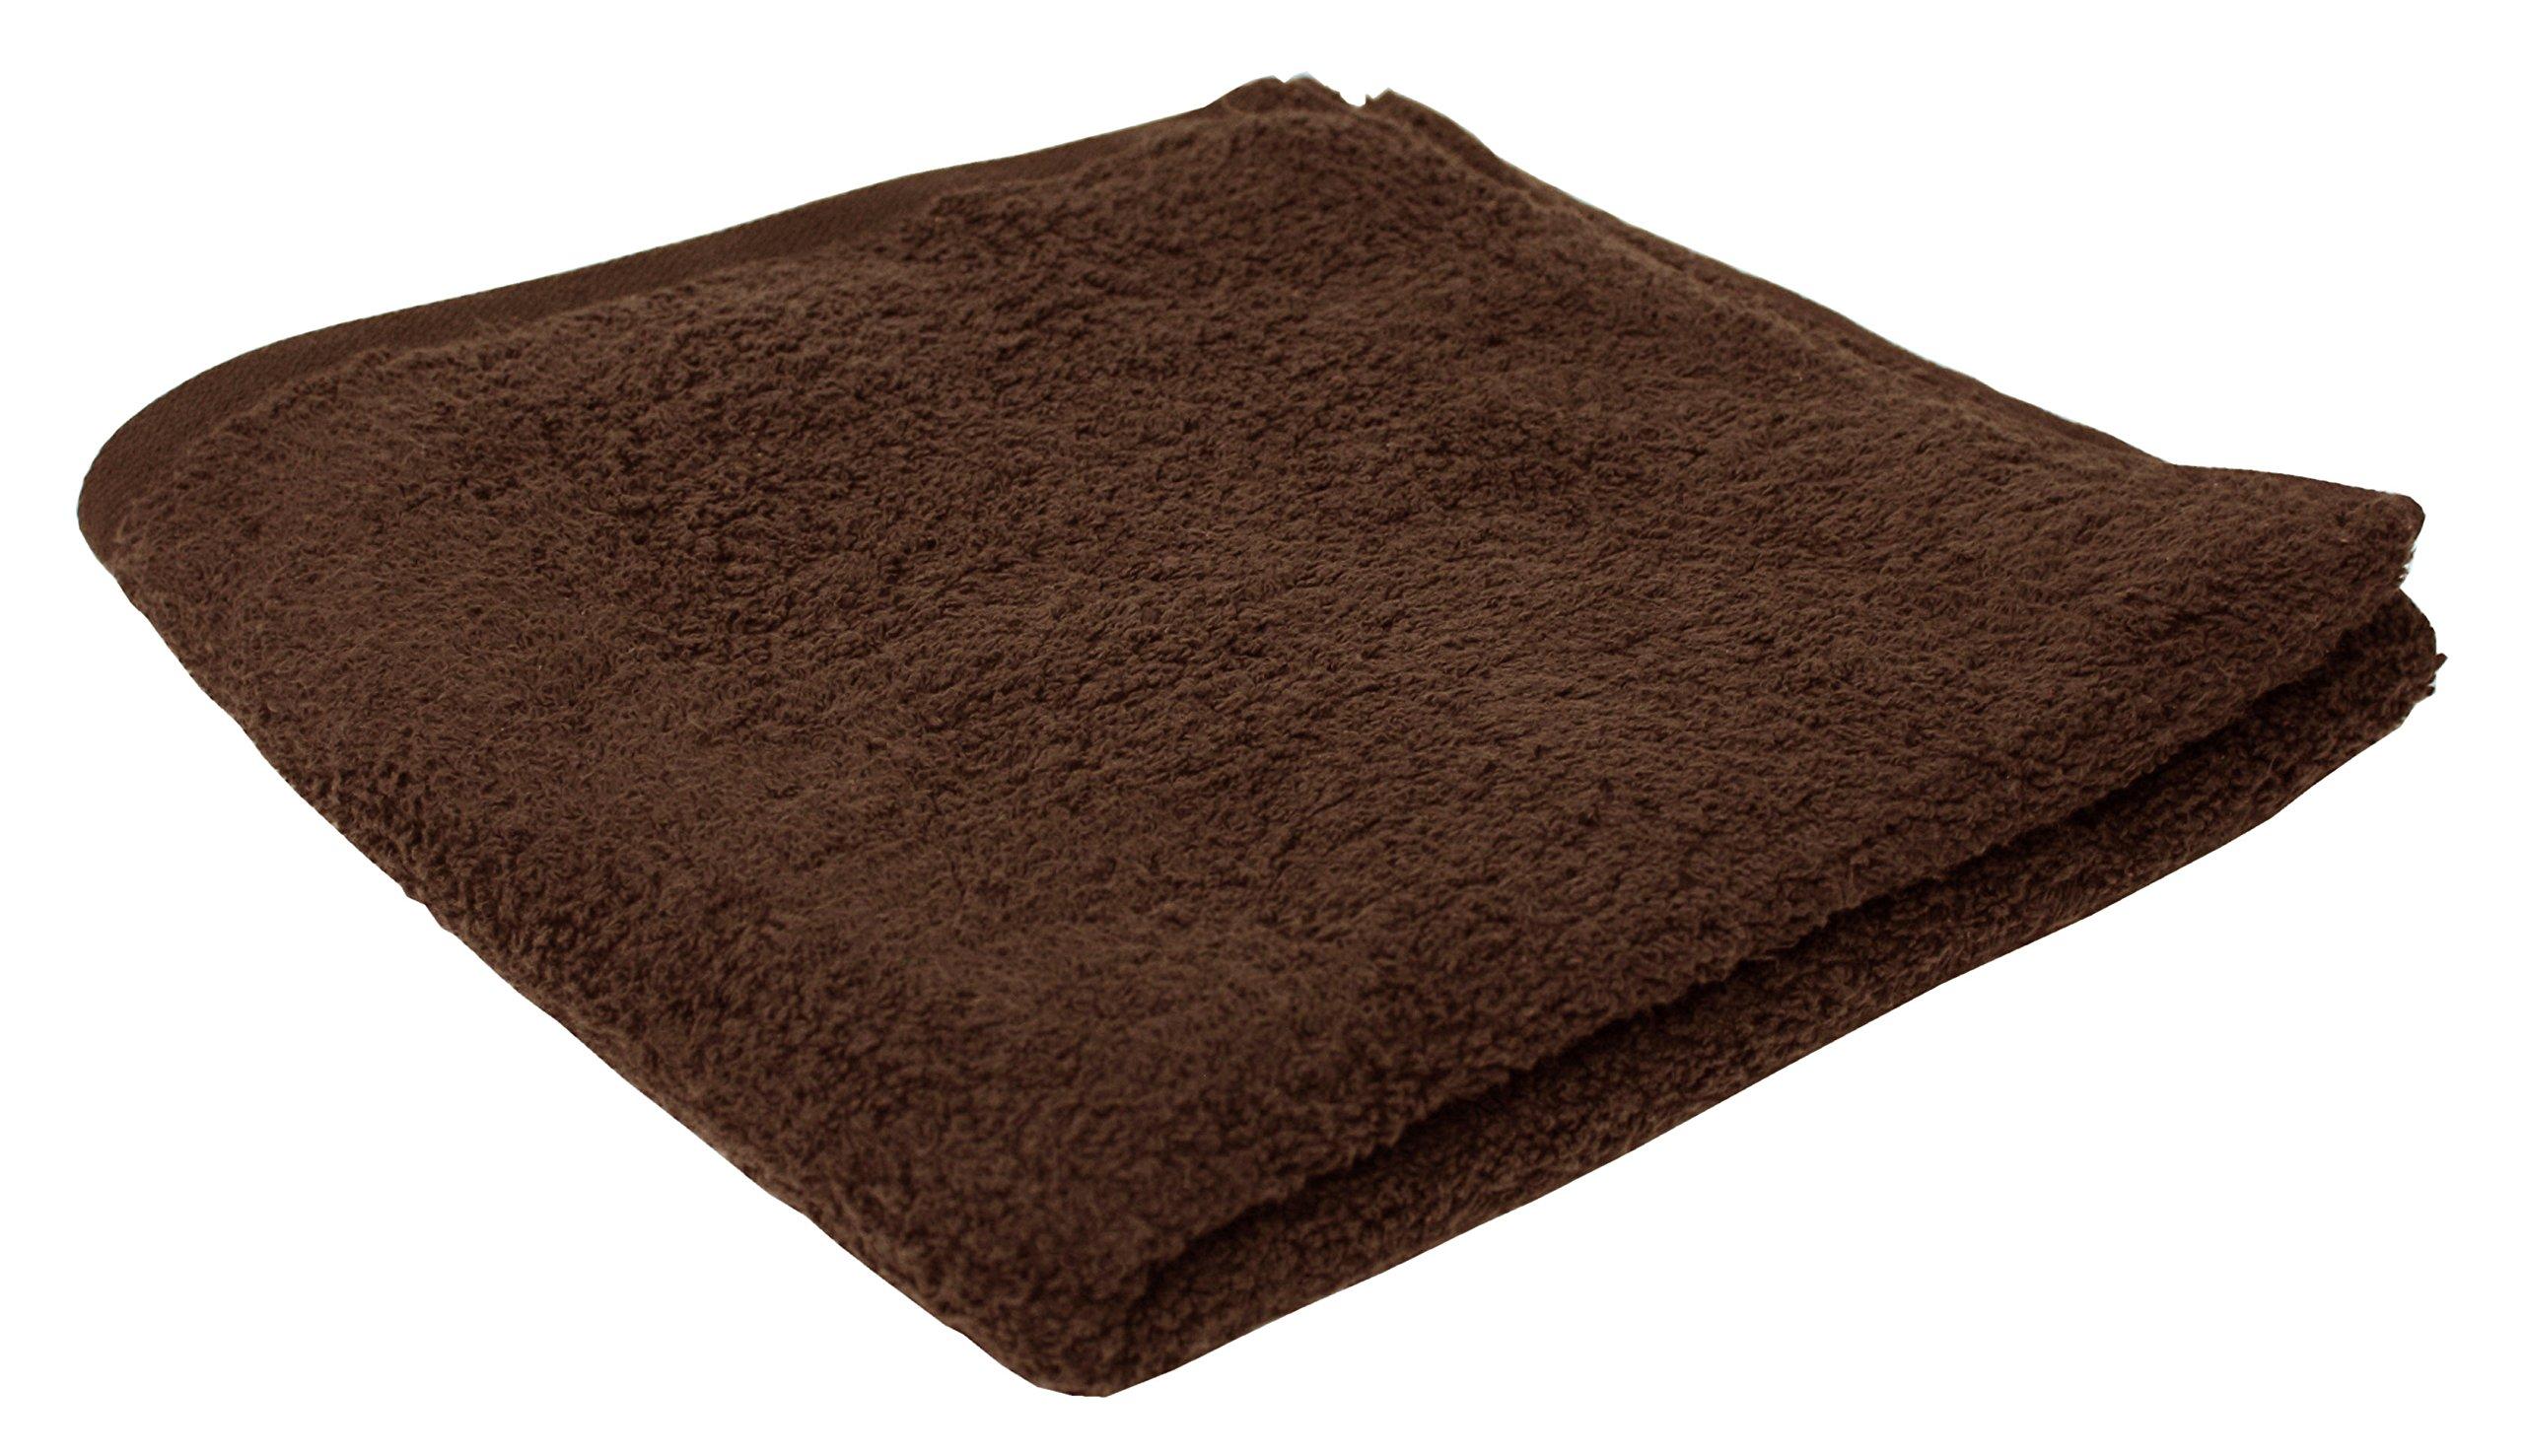 Luxury 36-Piece Bulk Pack Cotton Bath Towel Set, 25x50'', Hotel & Spa Quality, Super Soft and Ultra Absorbent for Bathroom & Washroom-Coffee Brown